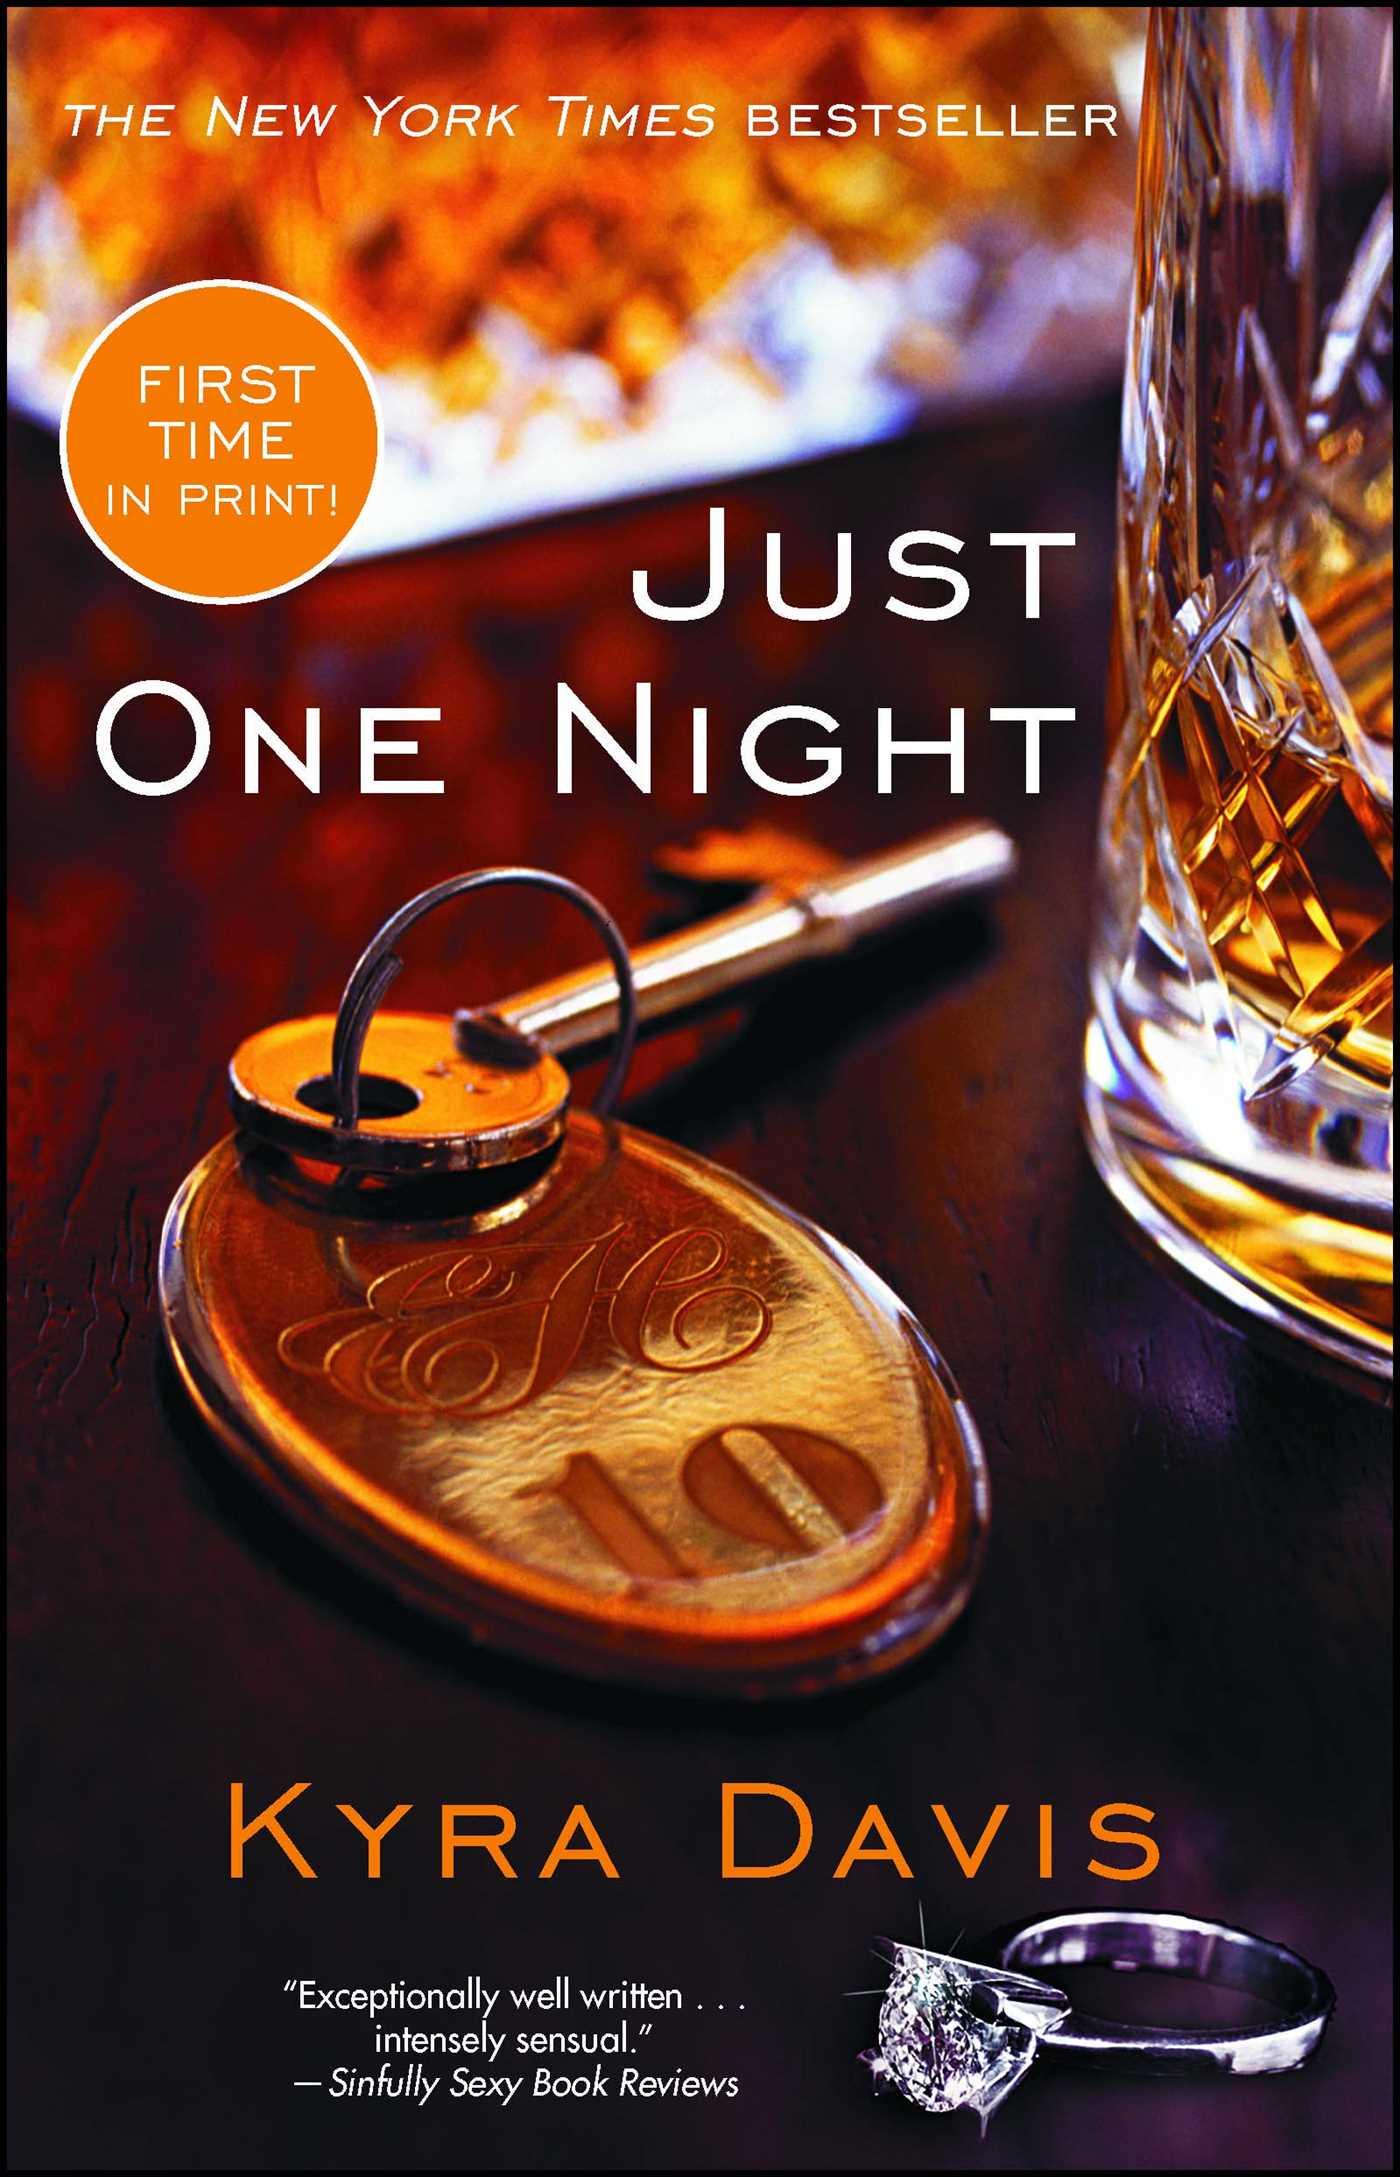 Just one night 9781476730608 hr